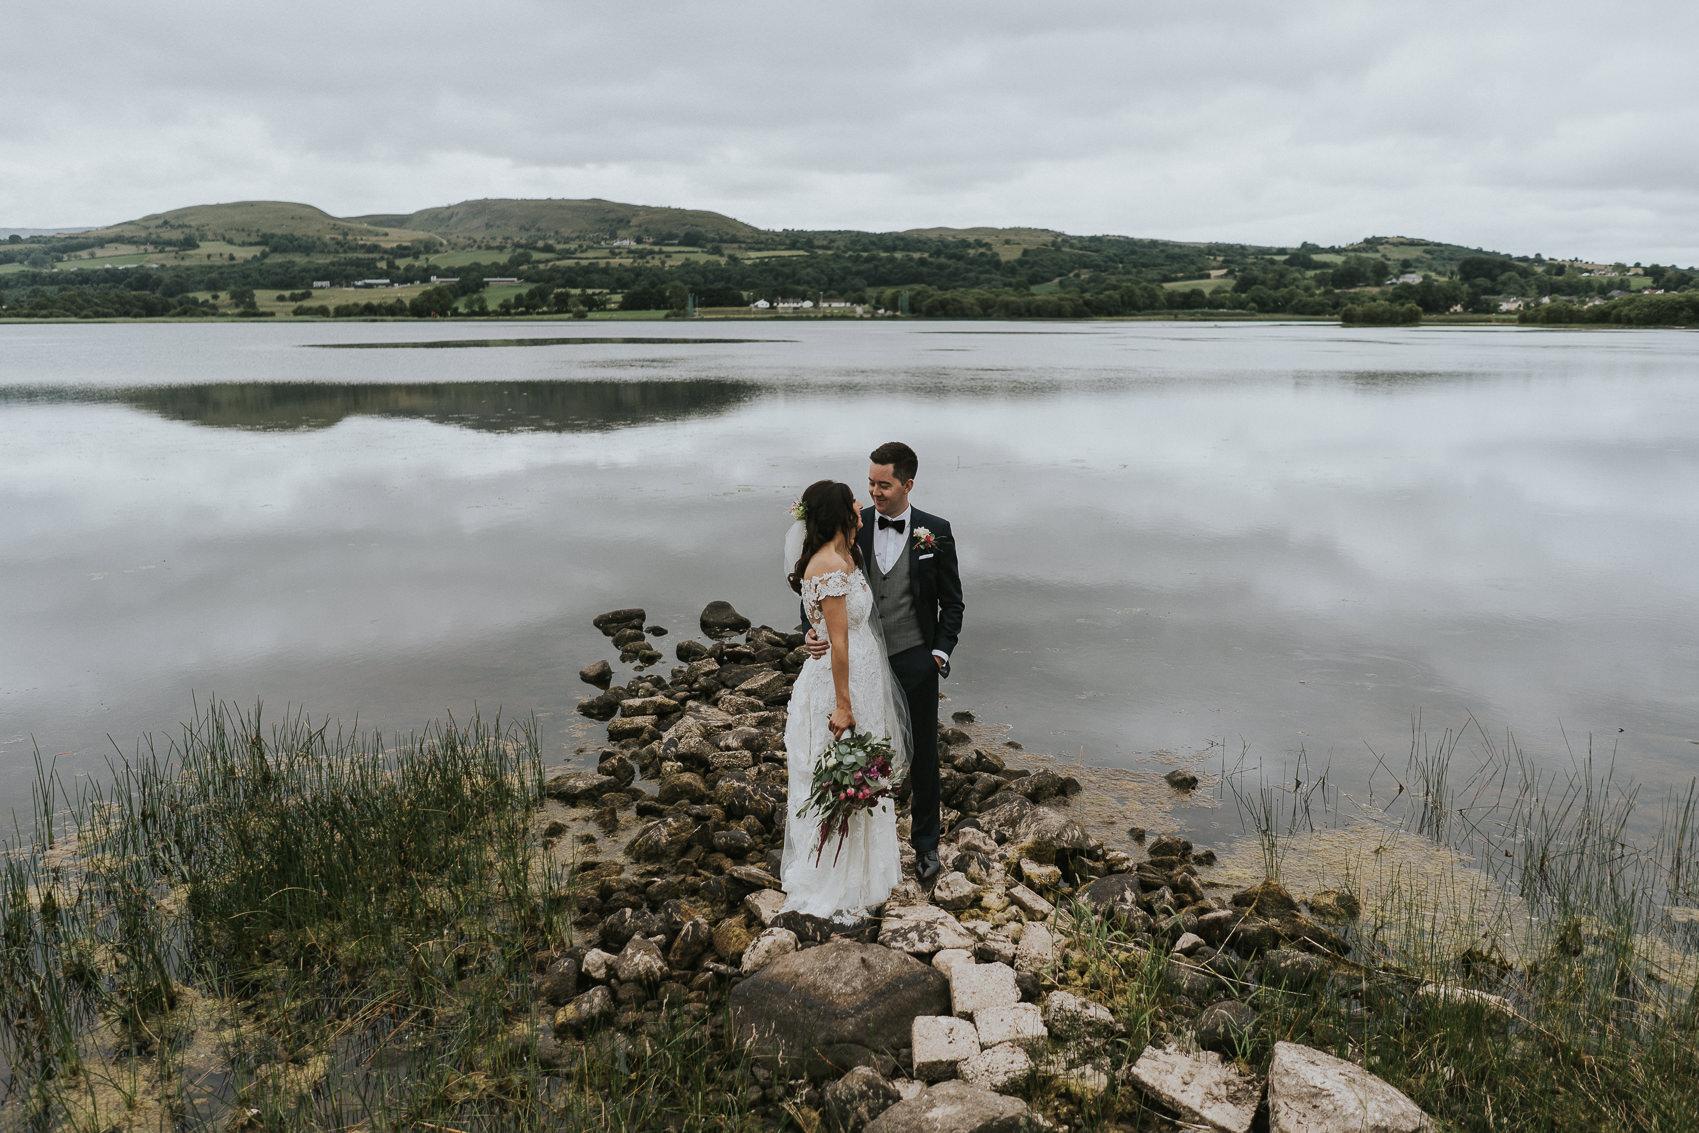 Photography by Ciara - wedding photographer 4